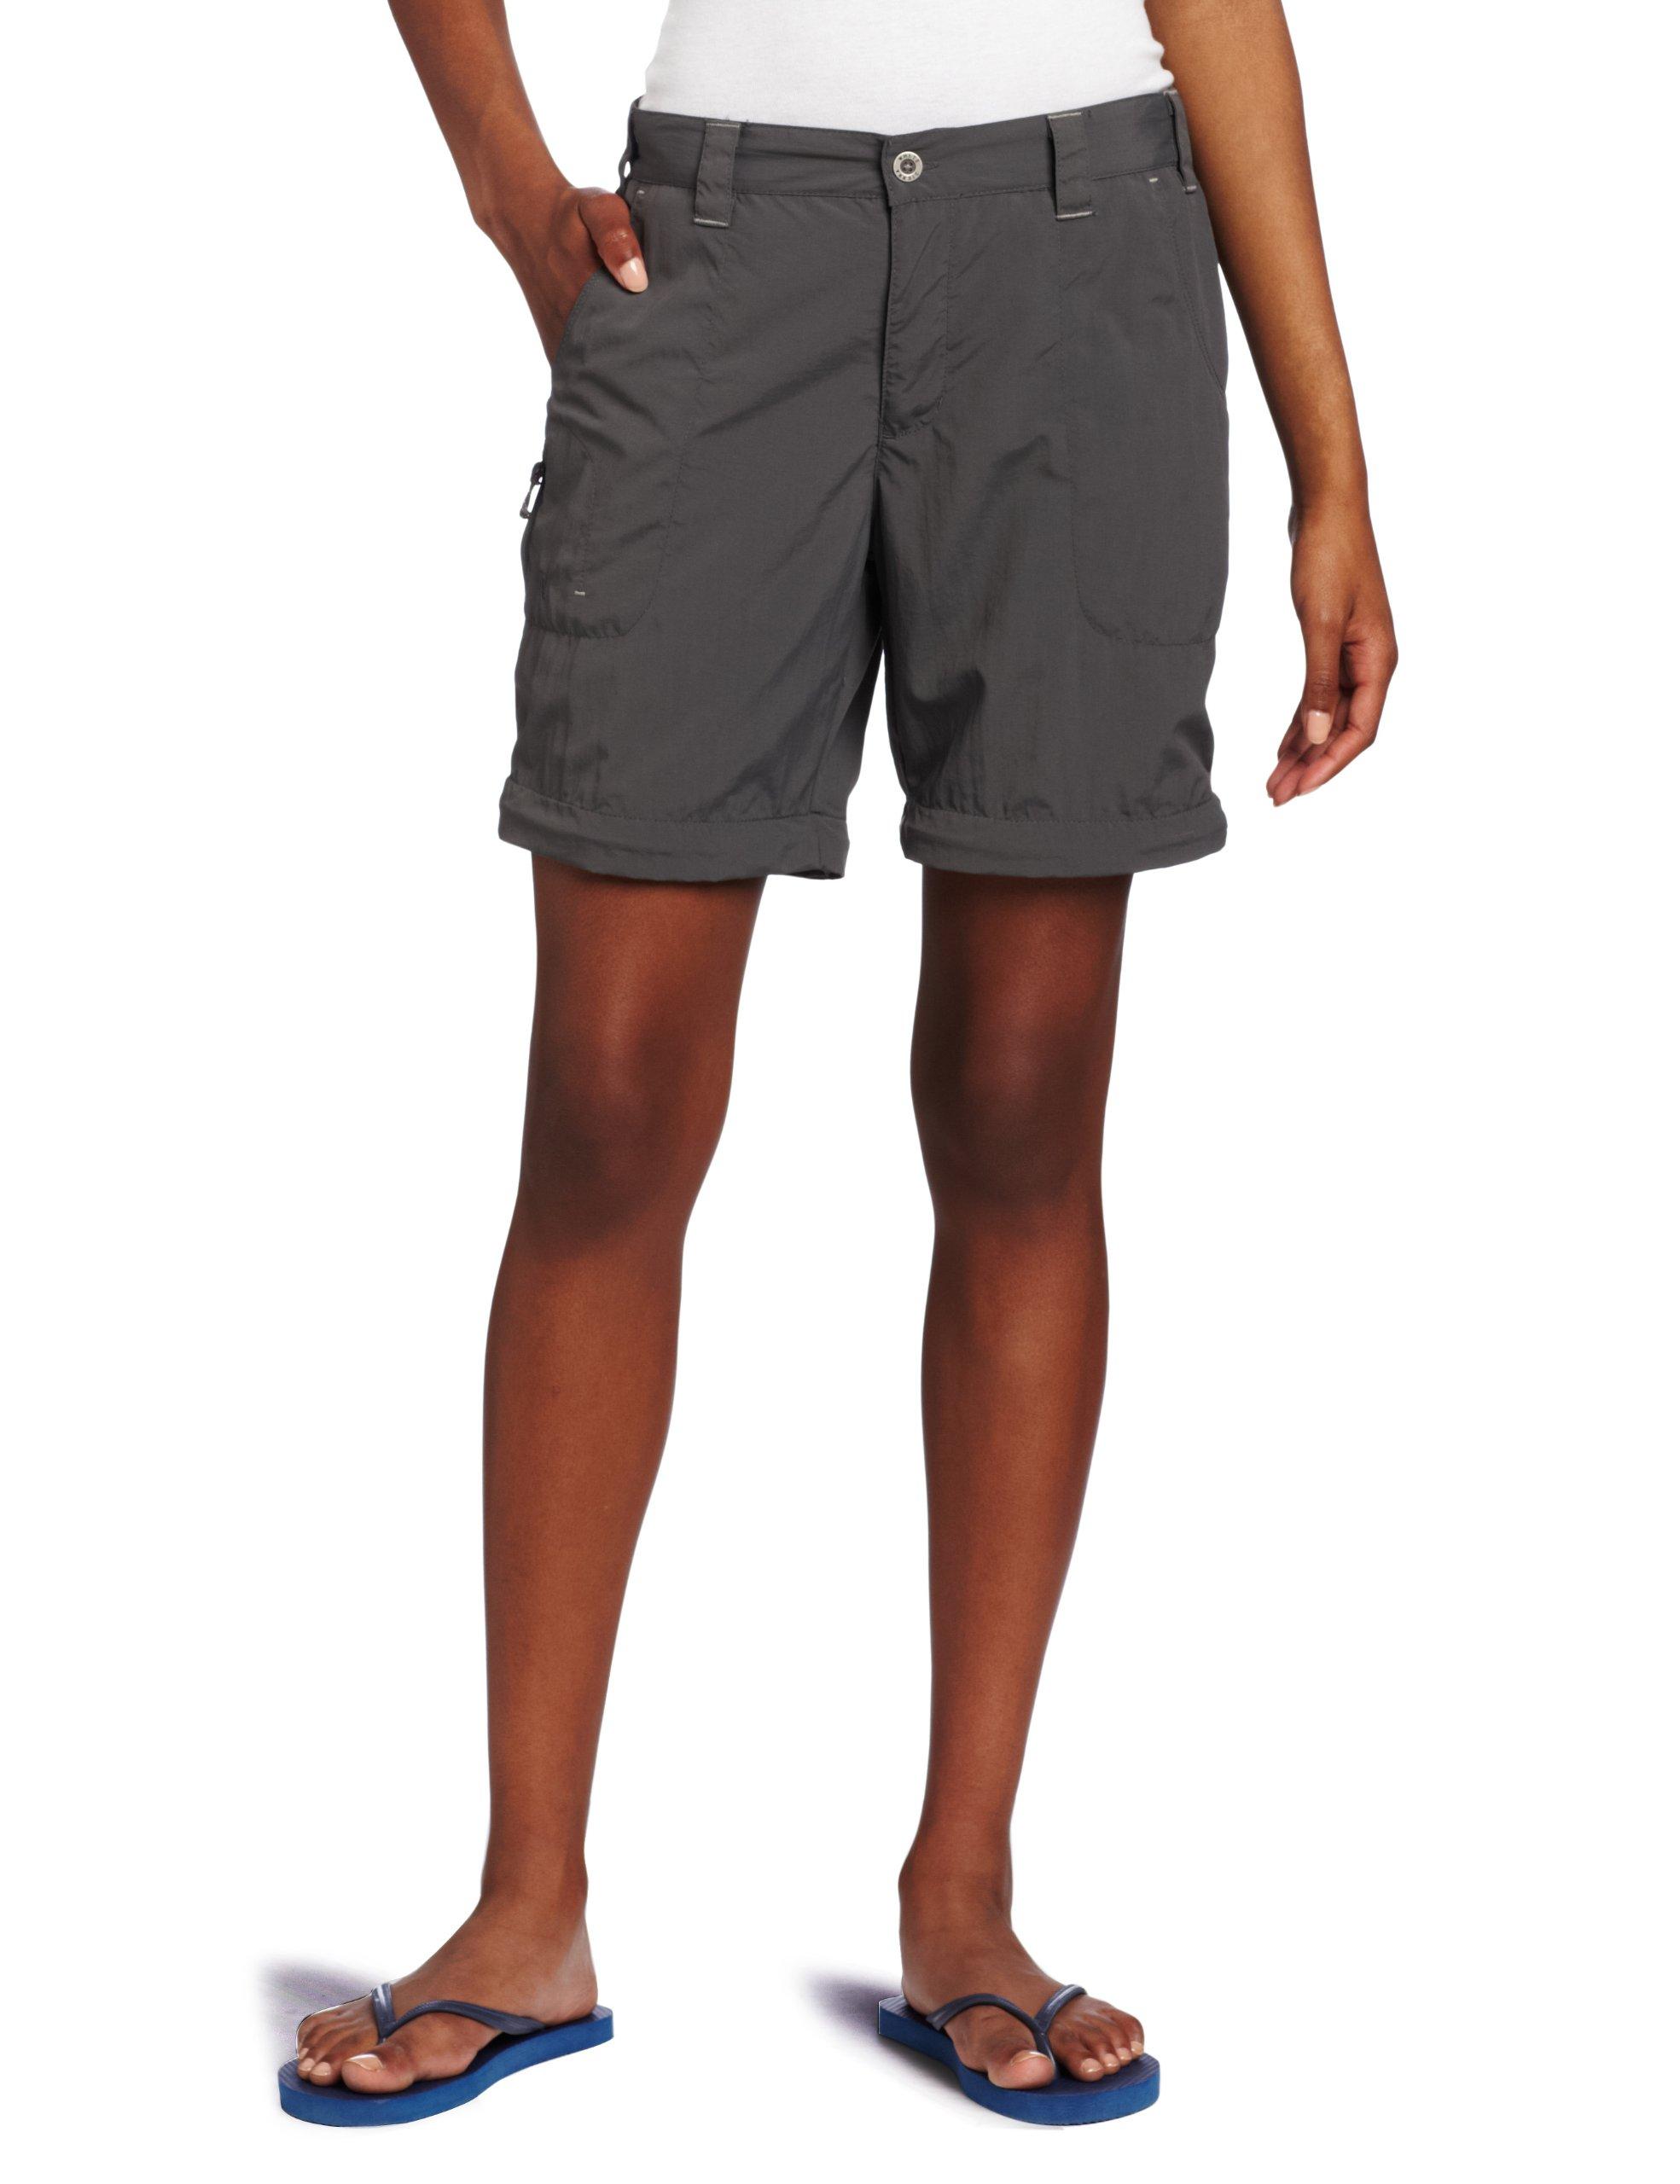 White Sierra Women's Sierra Pt. Convertible Pants - Extended Size, Caviar, 2X by White Sierra (Image #3)